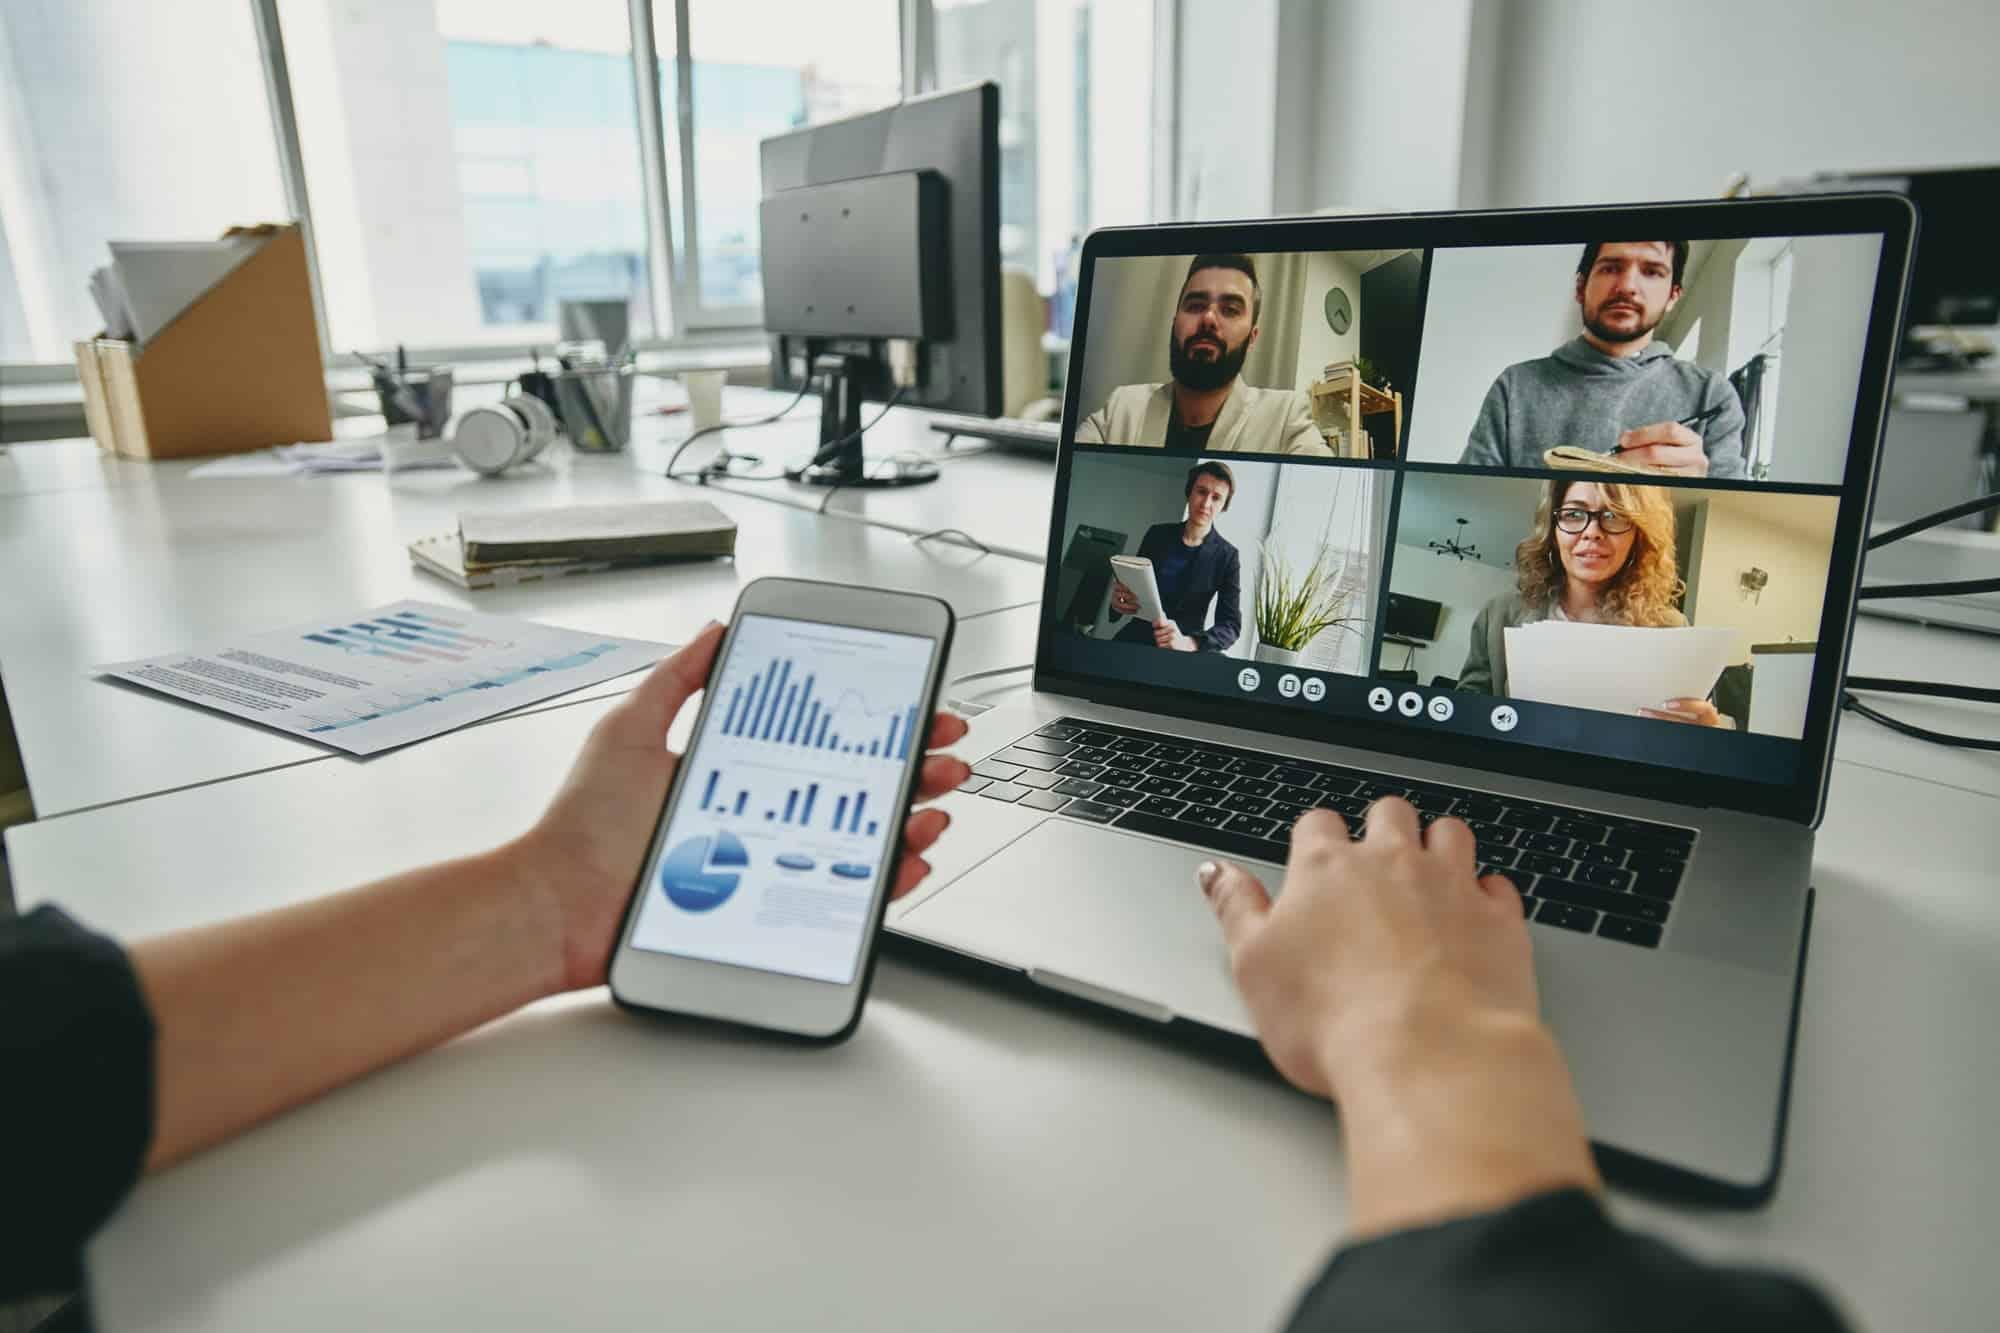 Meeting via video conferencing app